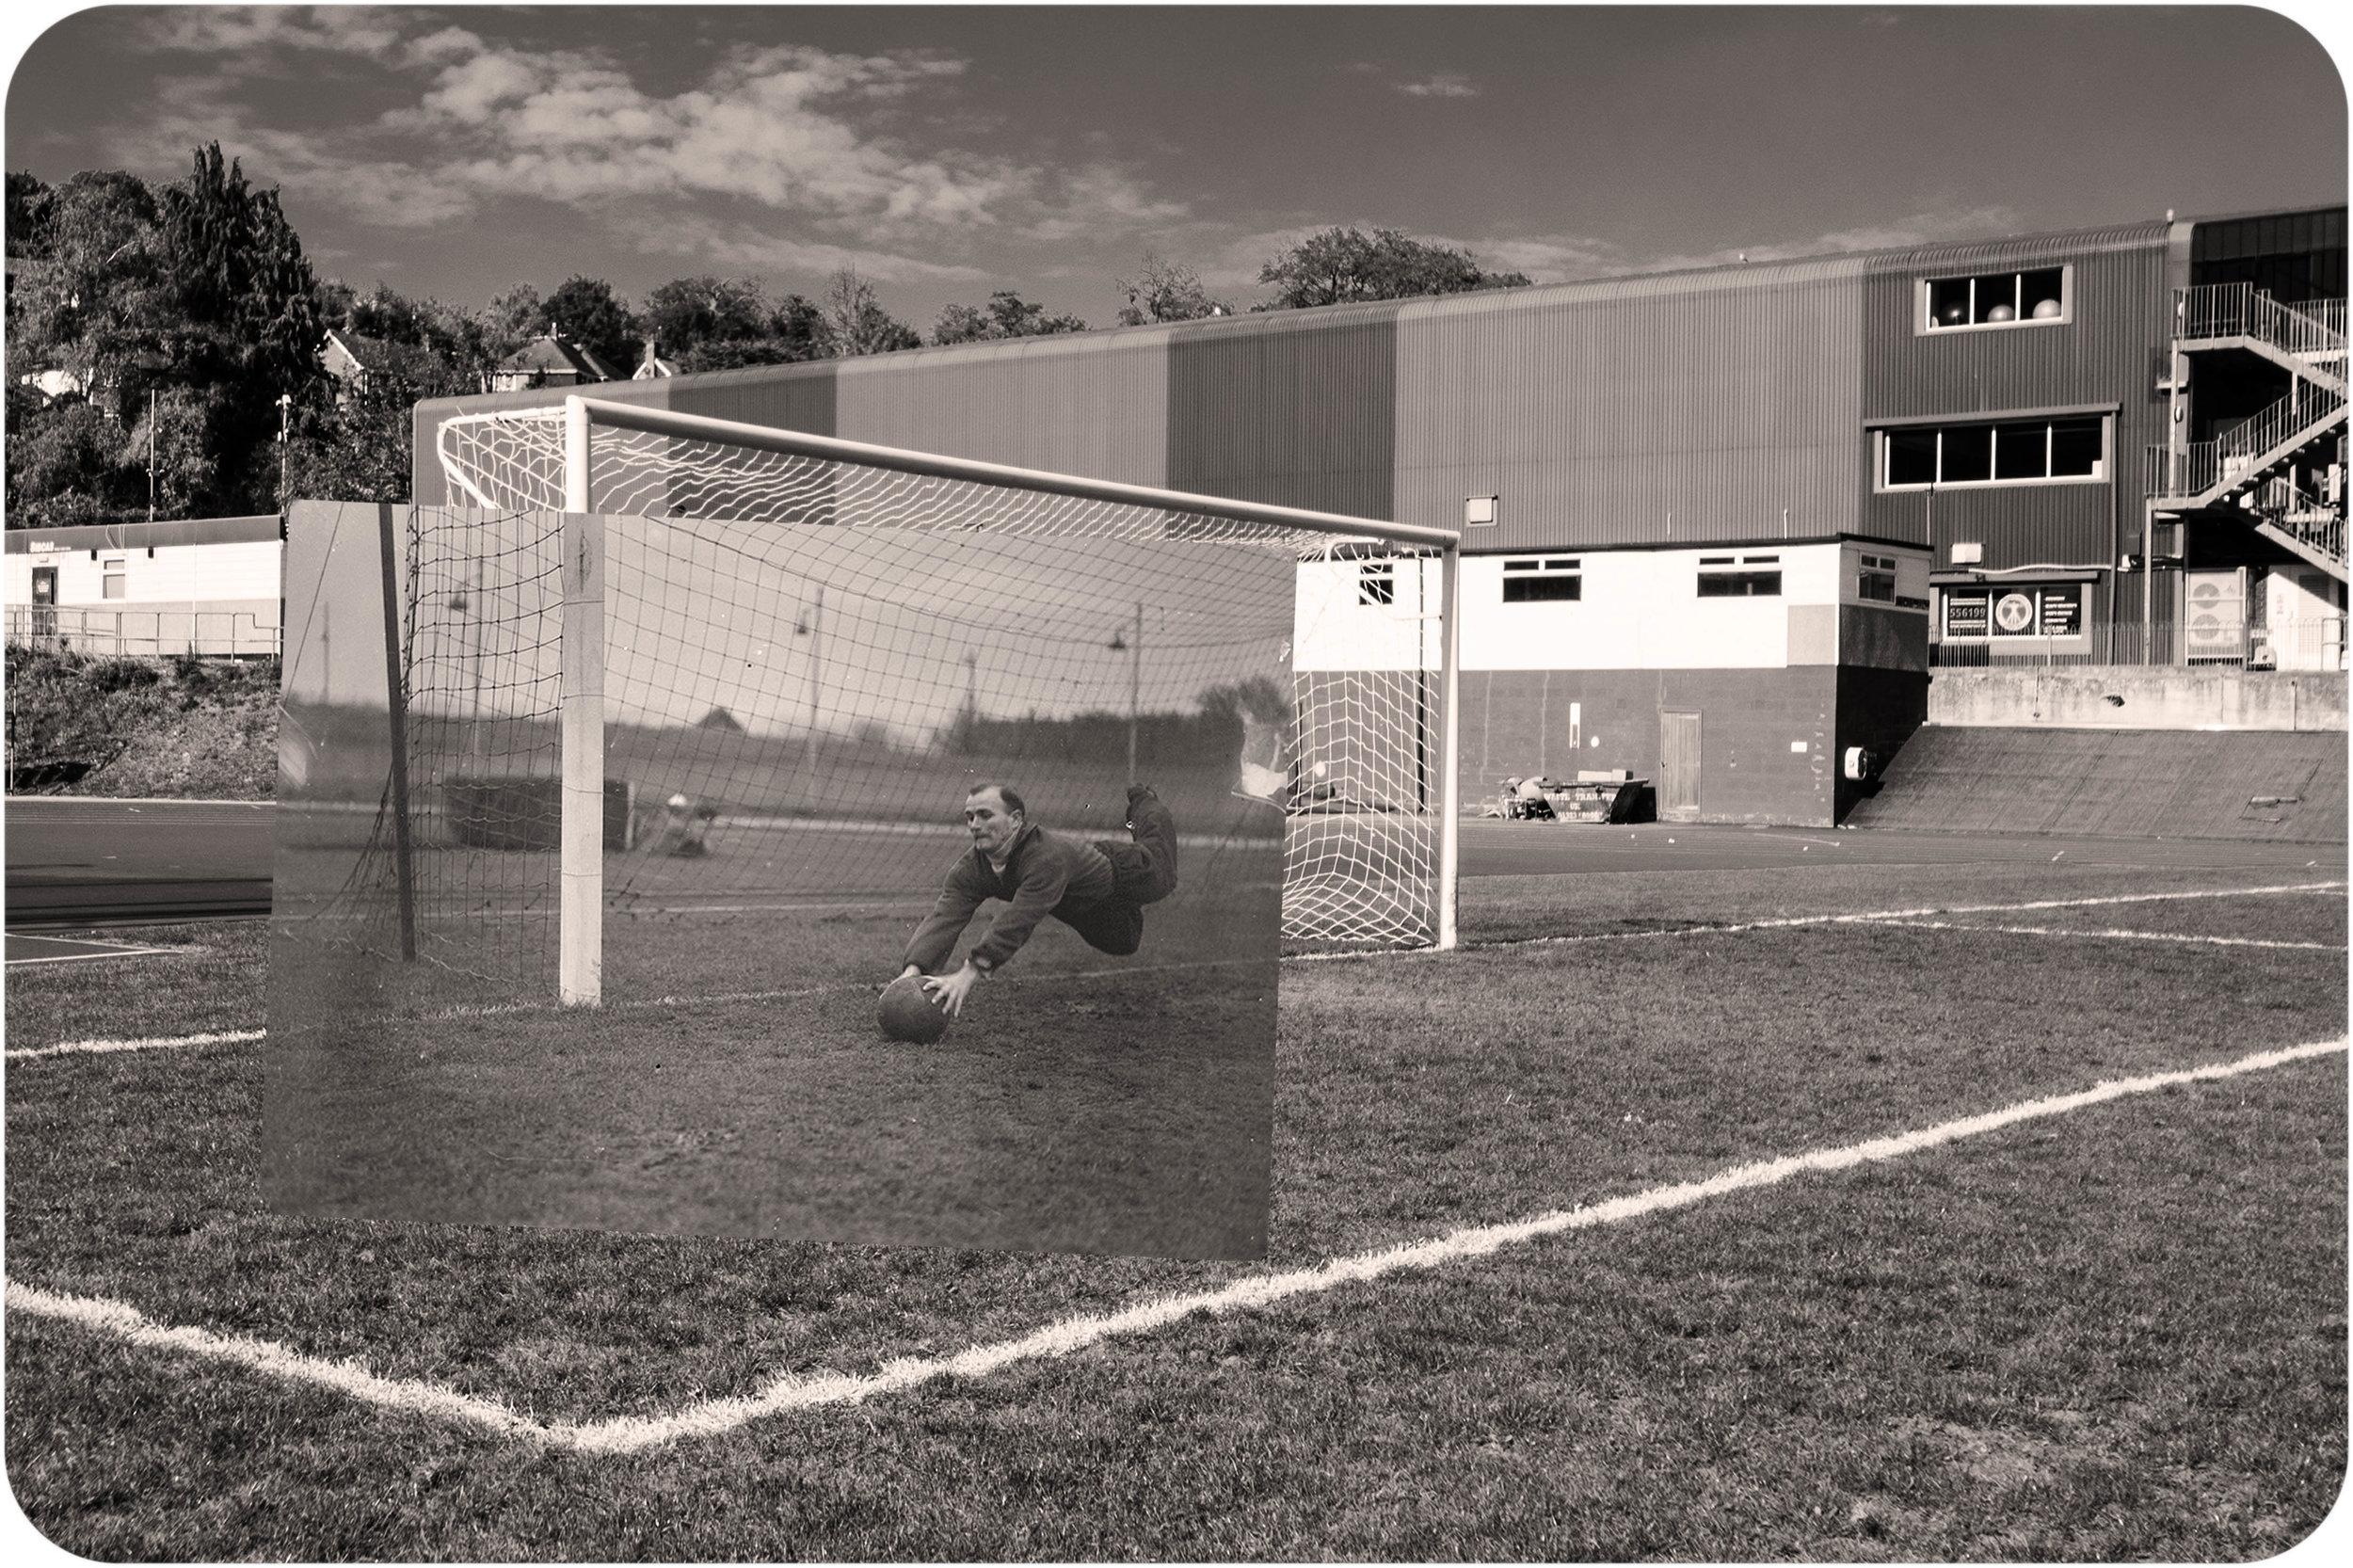 Playing goalie. Withdean Stadium. Brighton